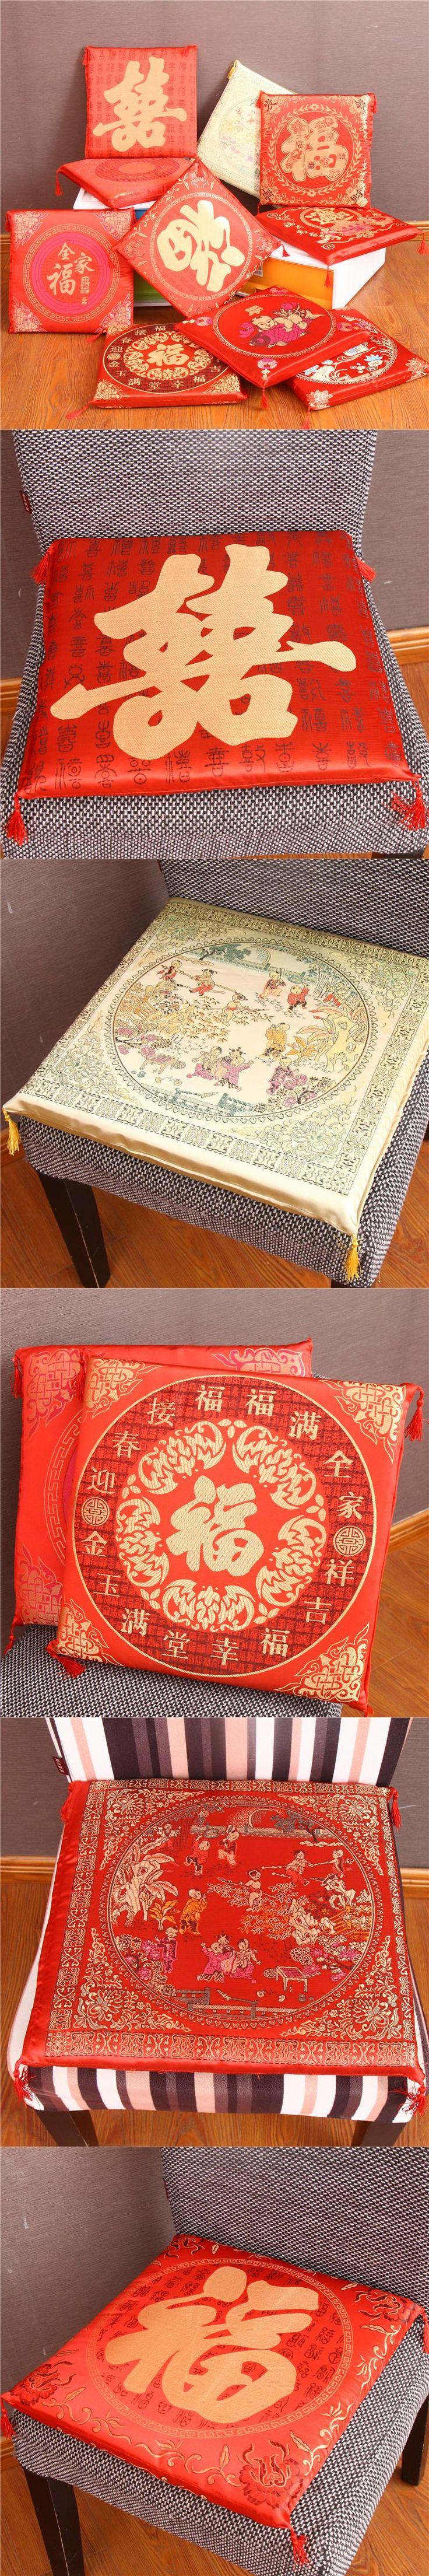 Best 25 Chinese sofa ideas on Pinterest